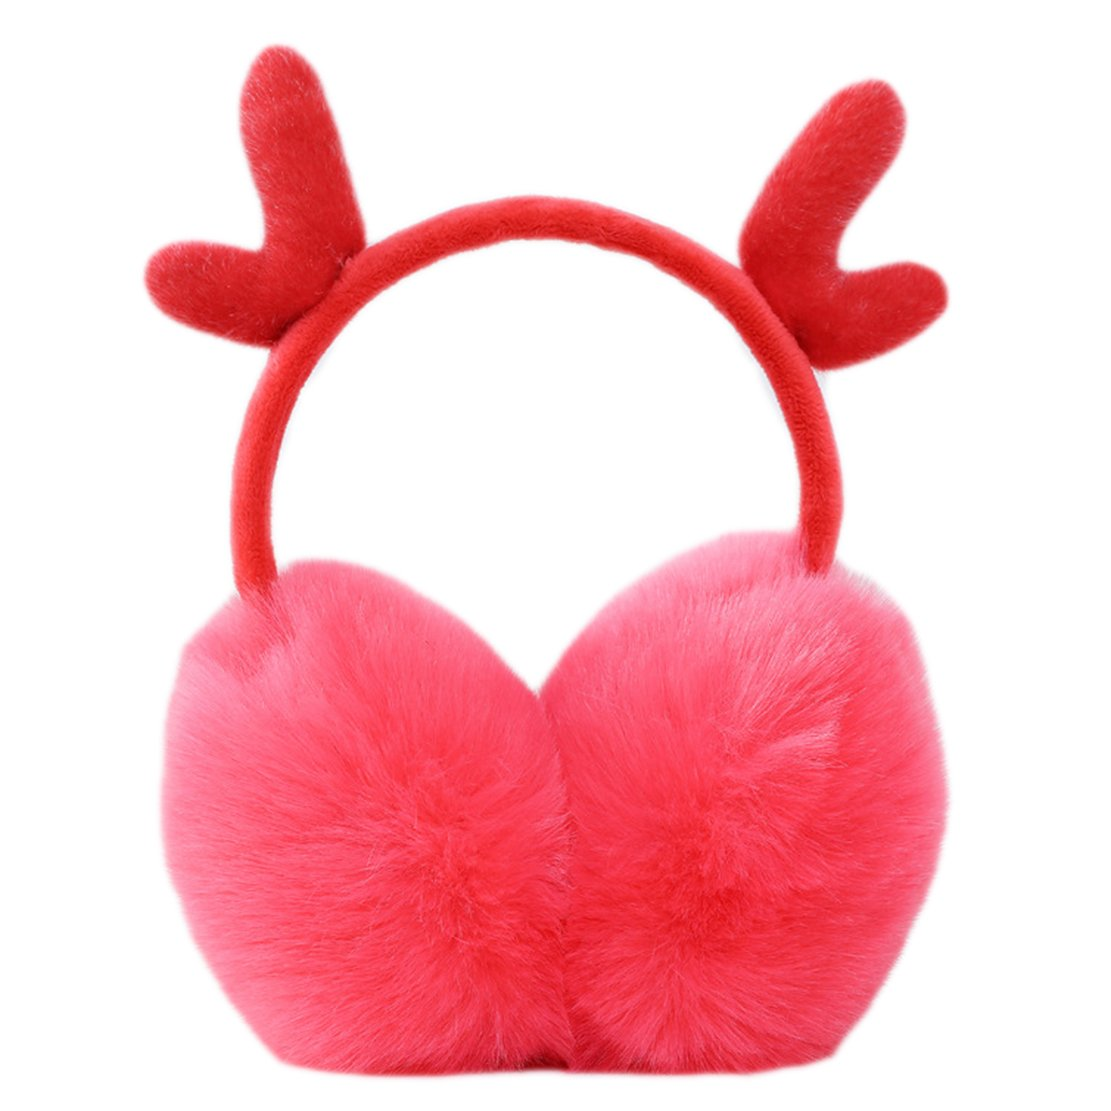 Freedi Women Earmuffs Faux Fur Reindeer Ear Warmers Winter Outdoor for Teens Girls Christmas Warm